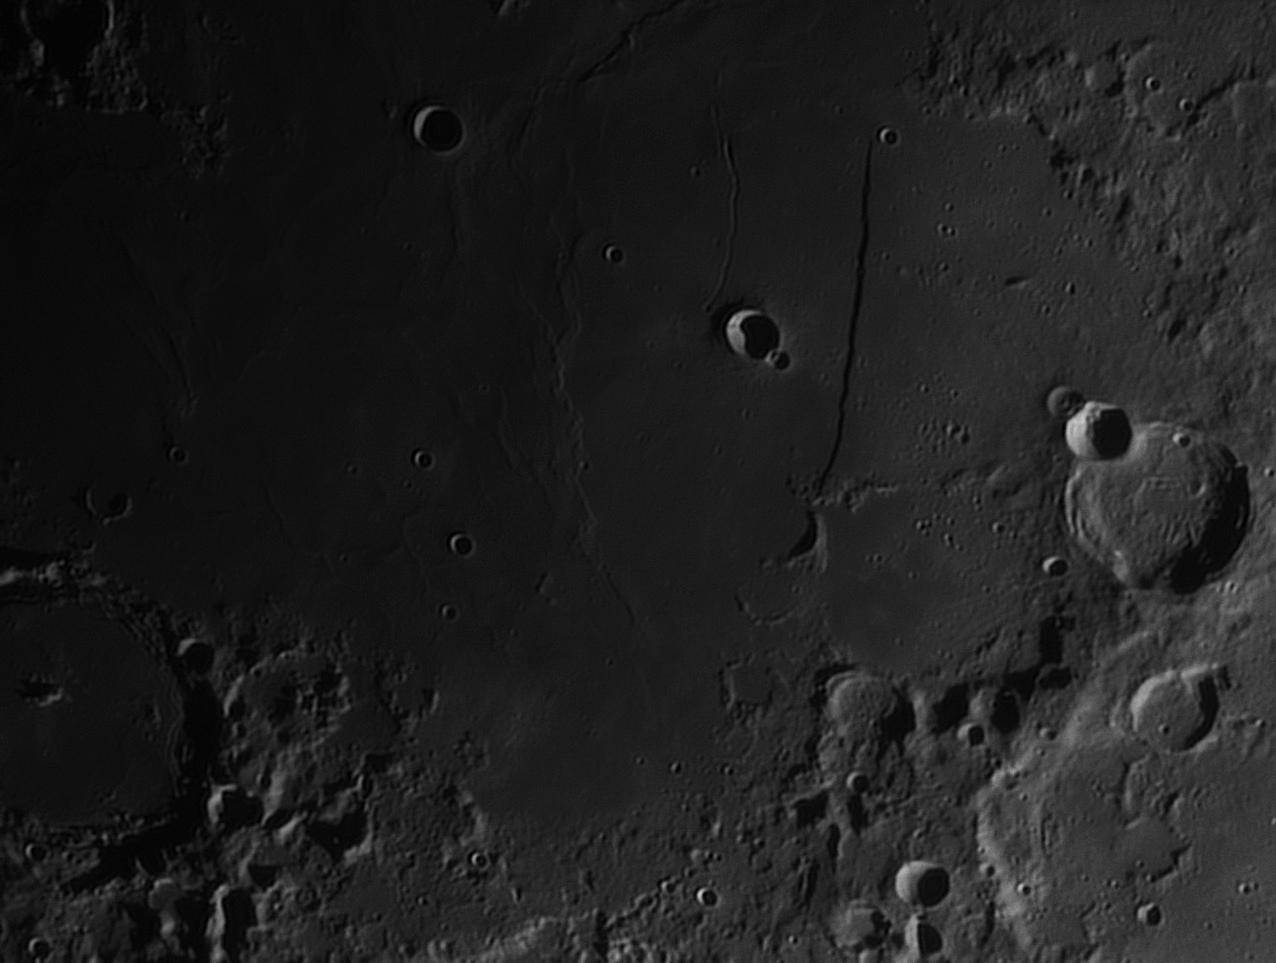 Moon_203935_lapl4_ap312 mur droit 3.jpg